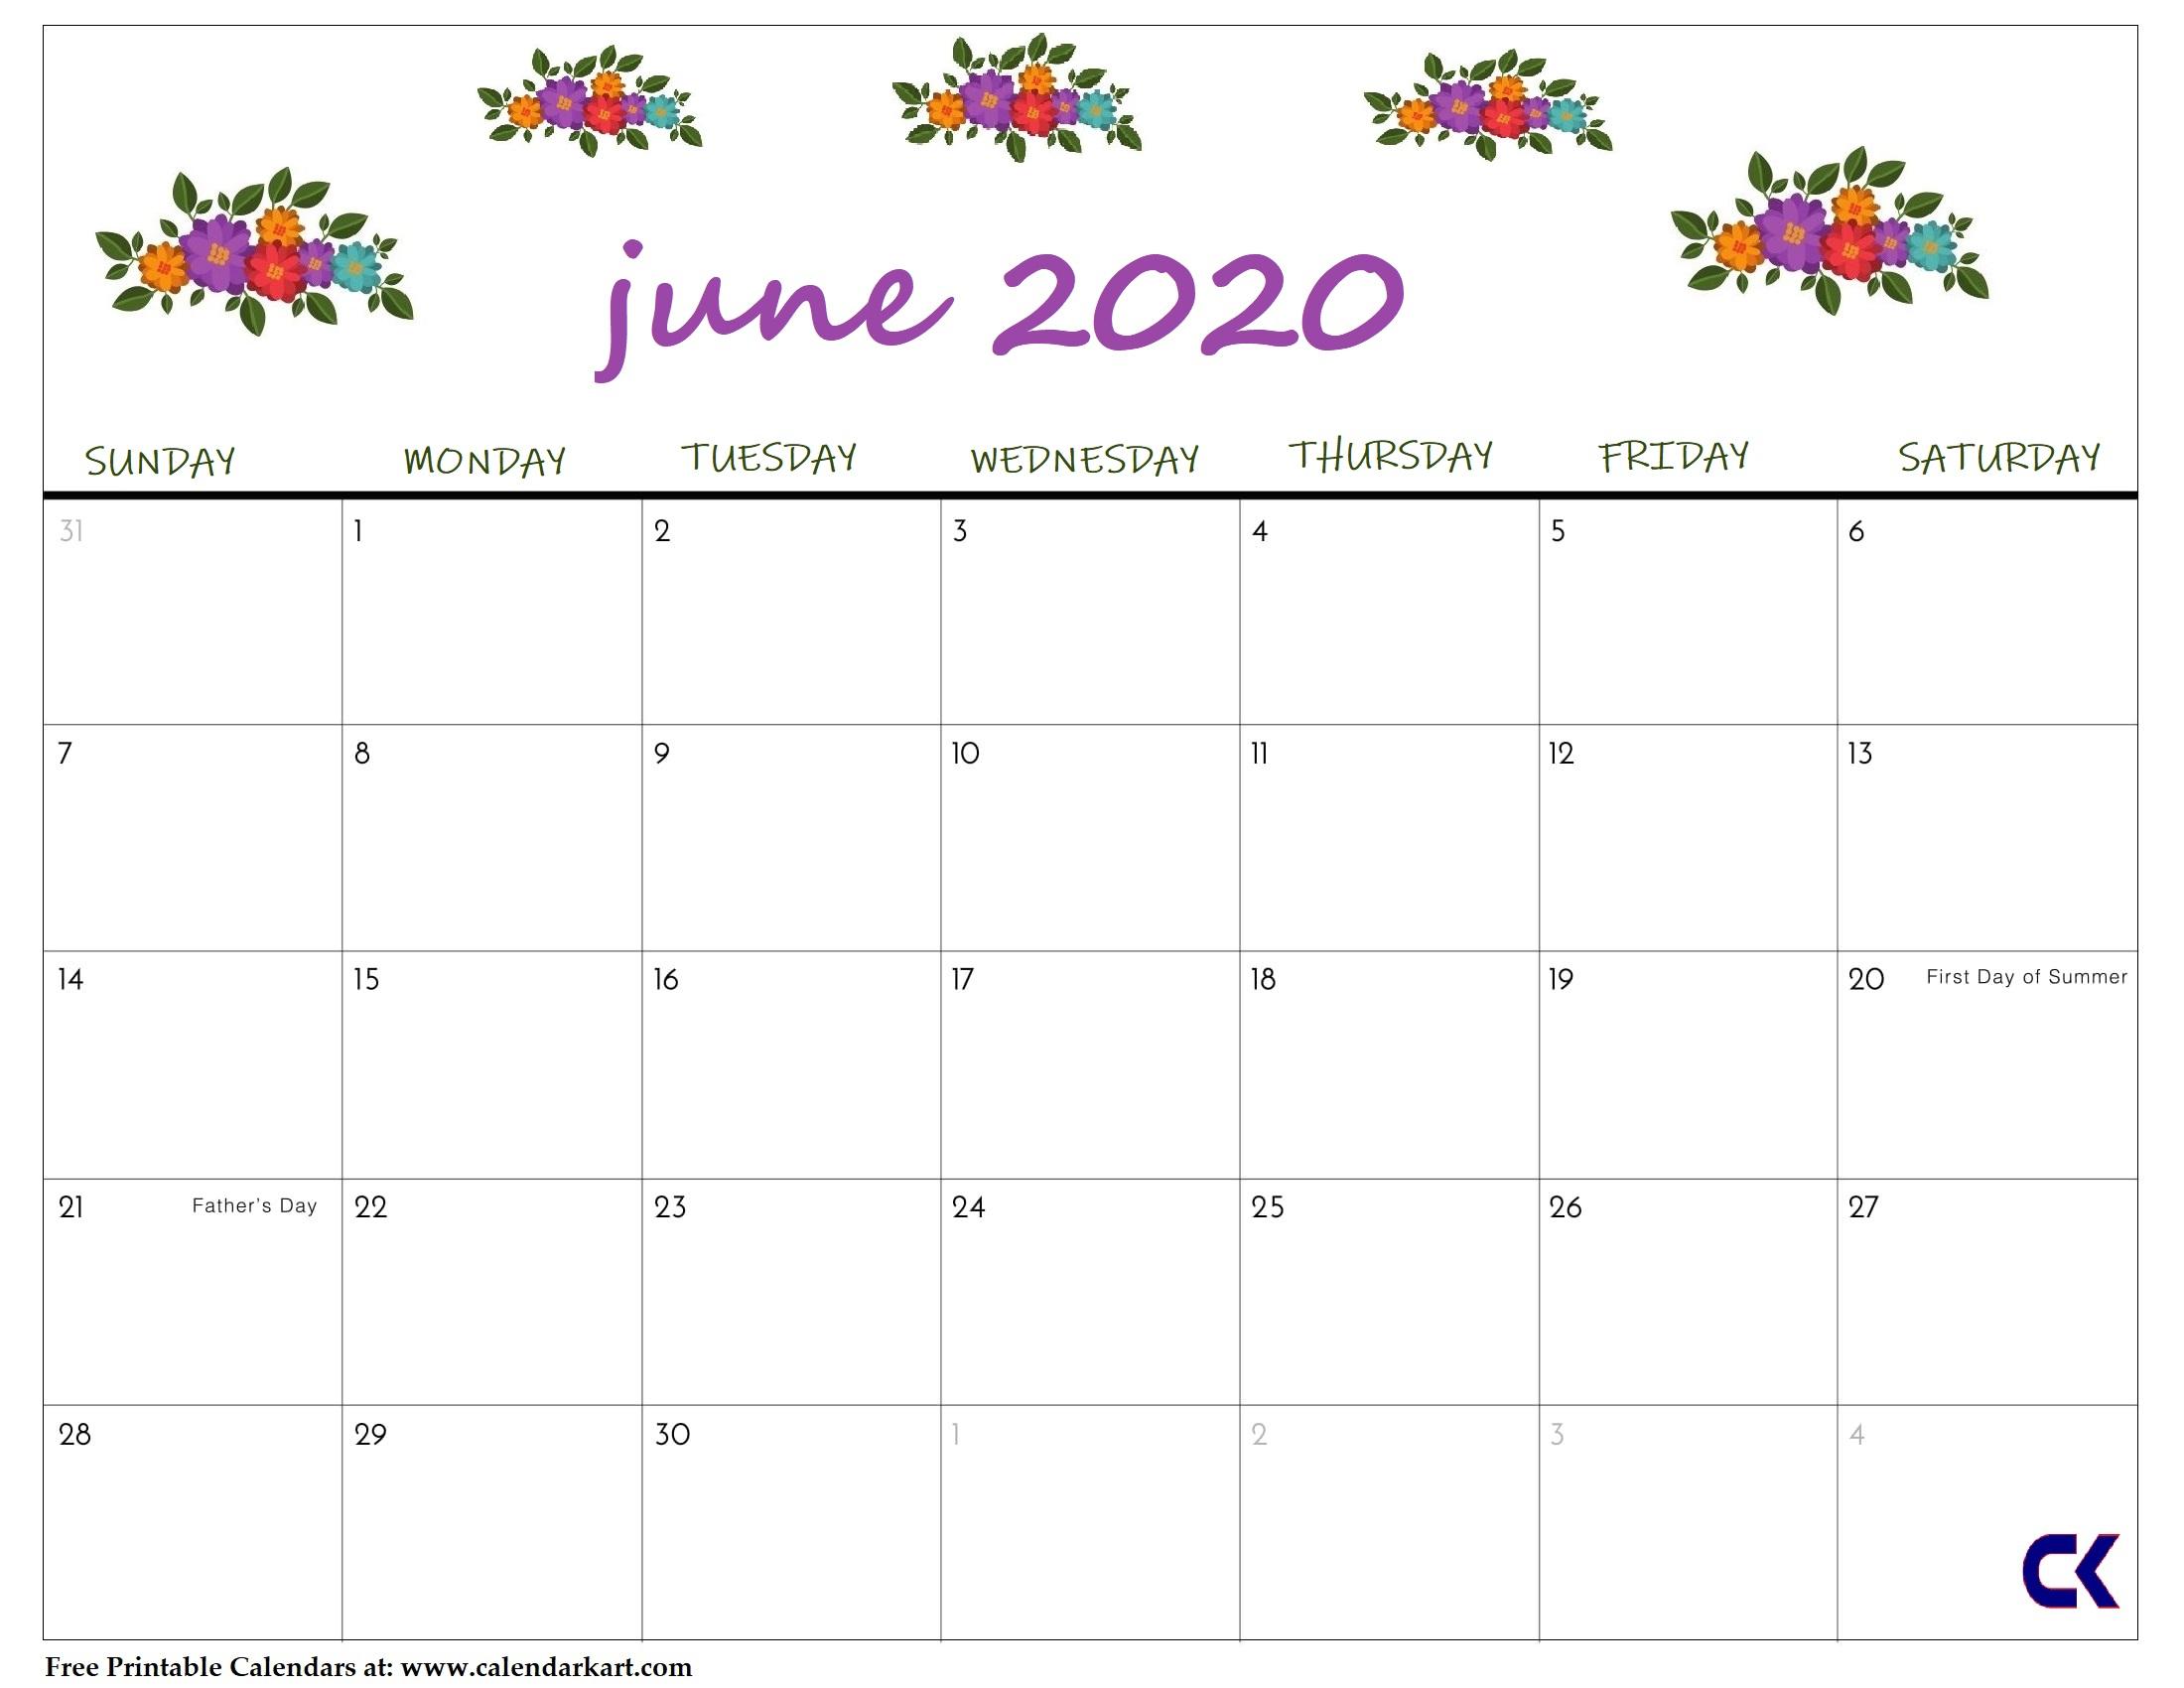 Printable June 2020 Calendar - Calendar-Kart